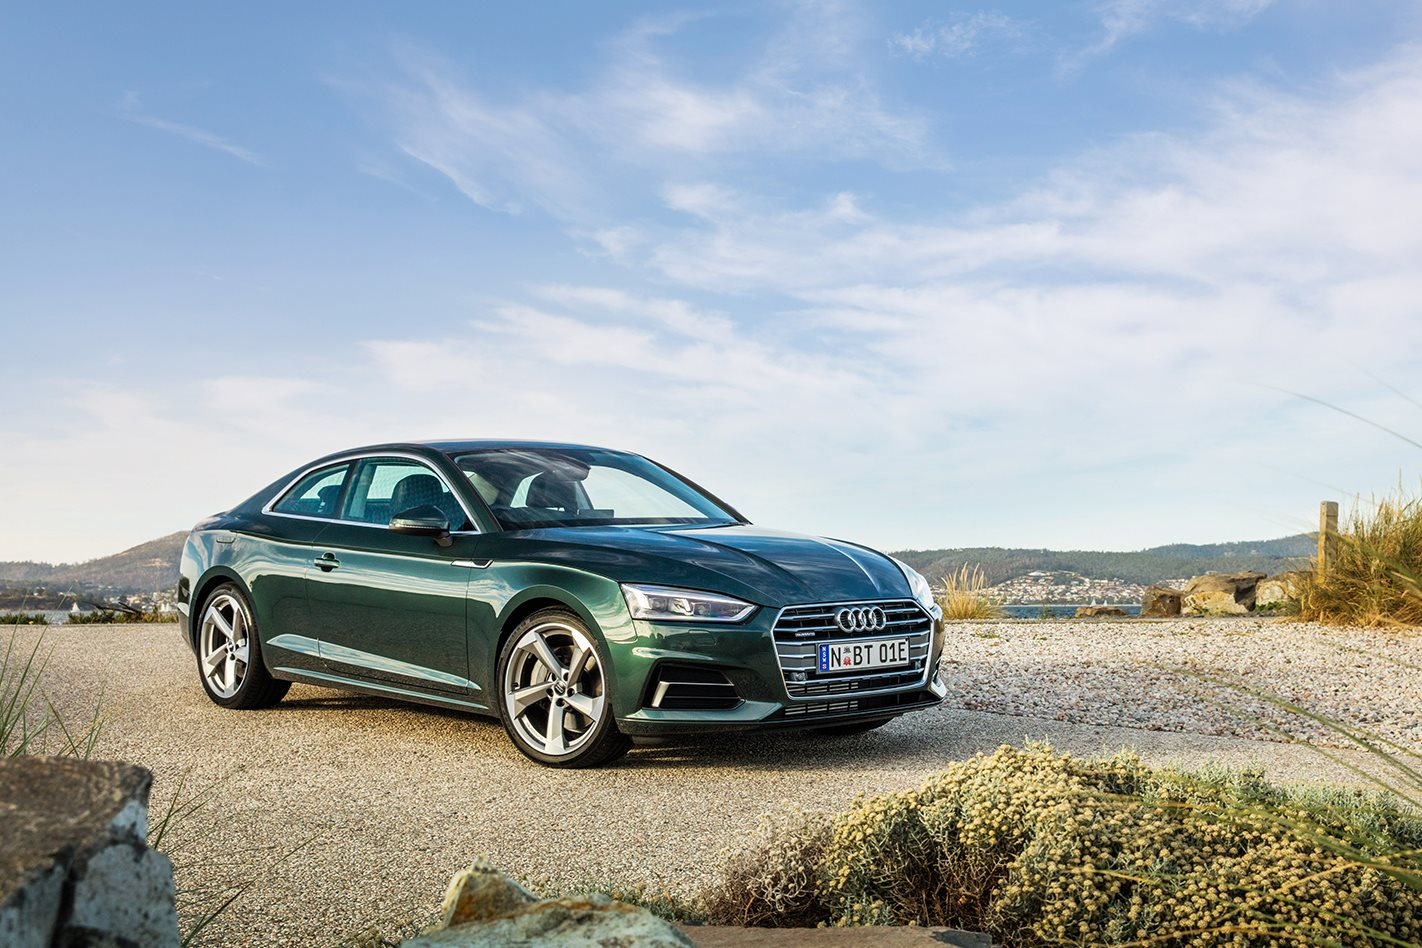 2017-Audi-A5-20-TFSI-Quattro-Sport-exterior.jpg